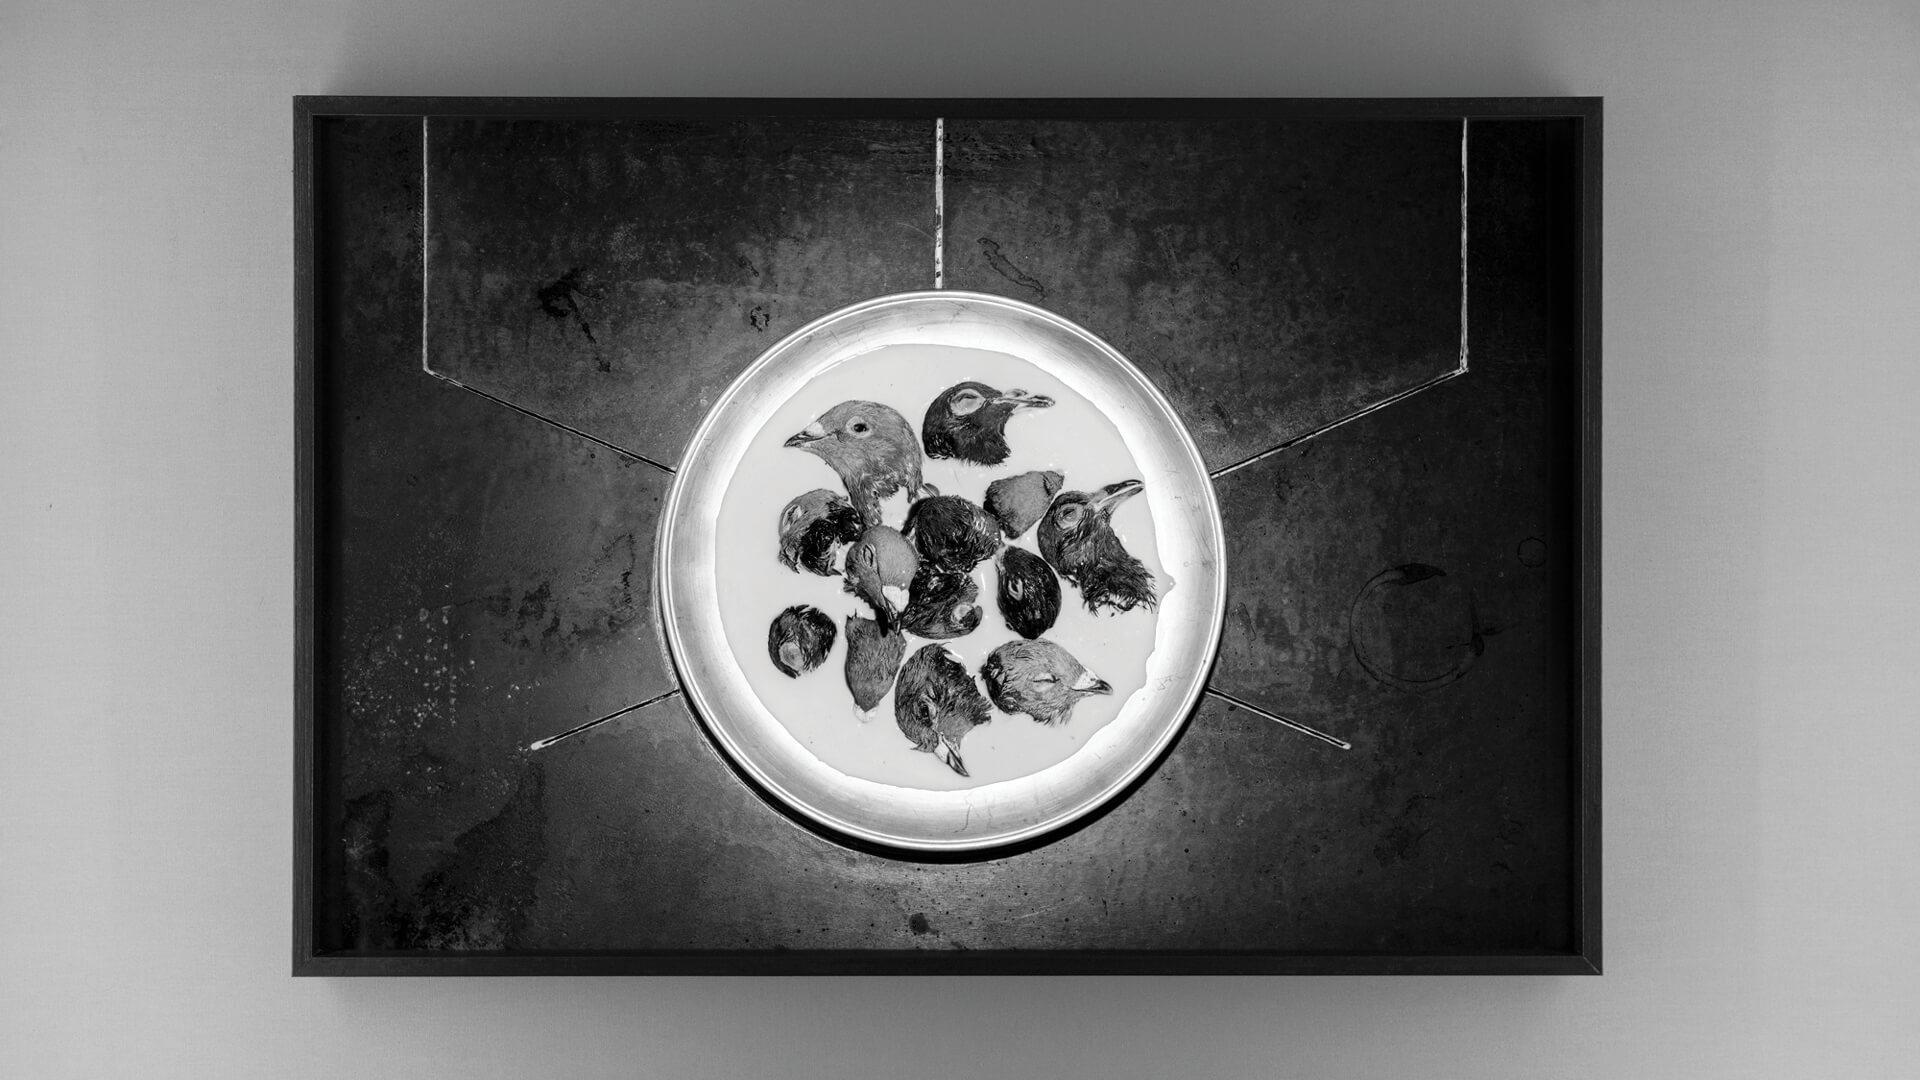 Photographer Elena Helfrecht discusses genetic memory and inherited trauma